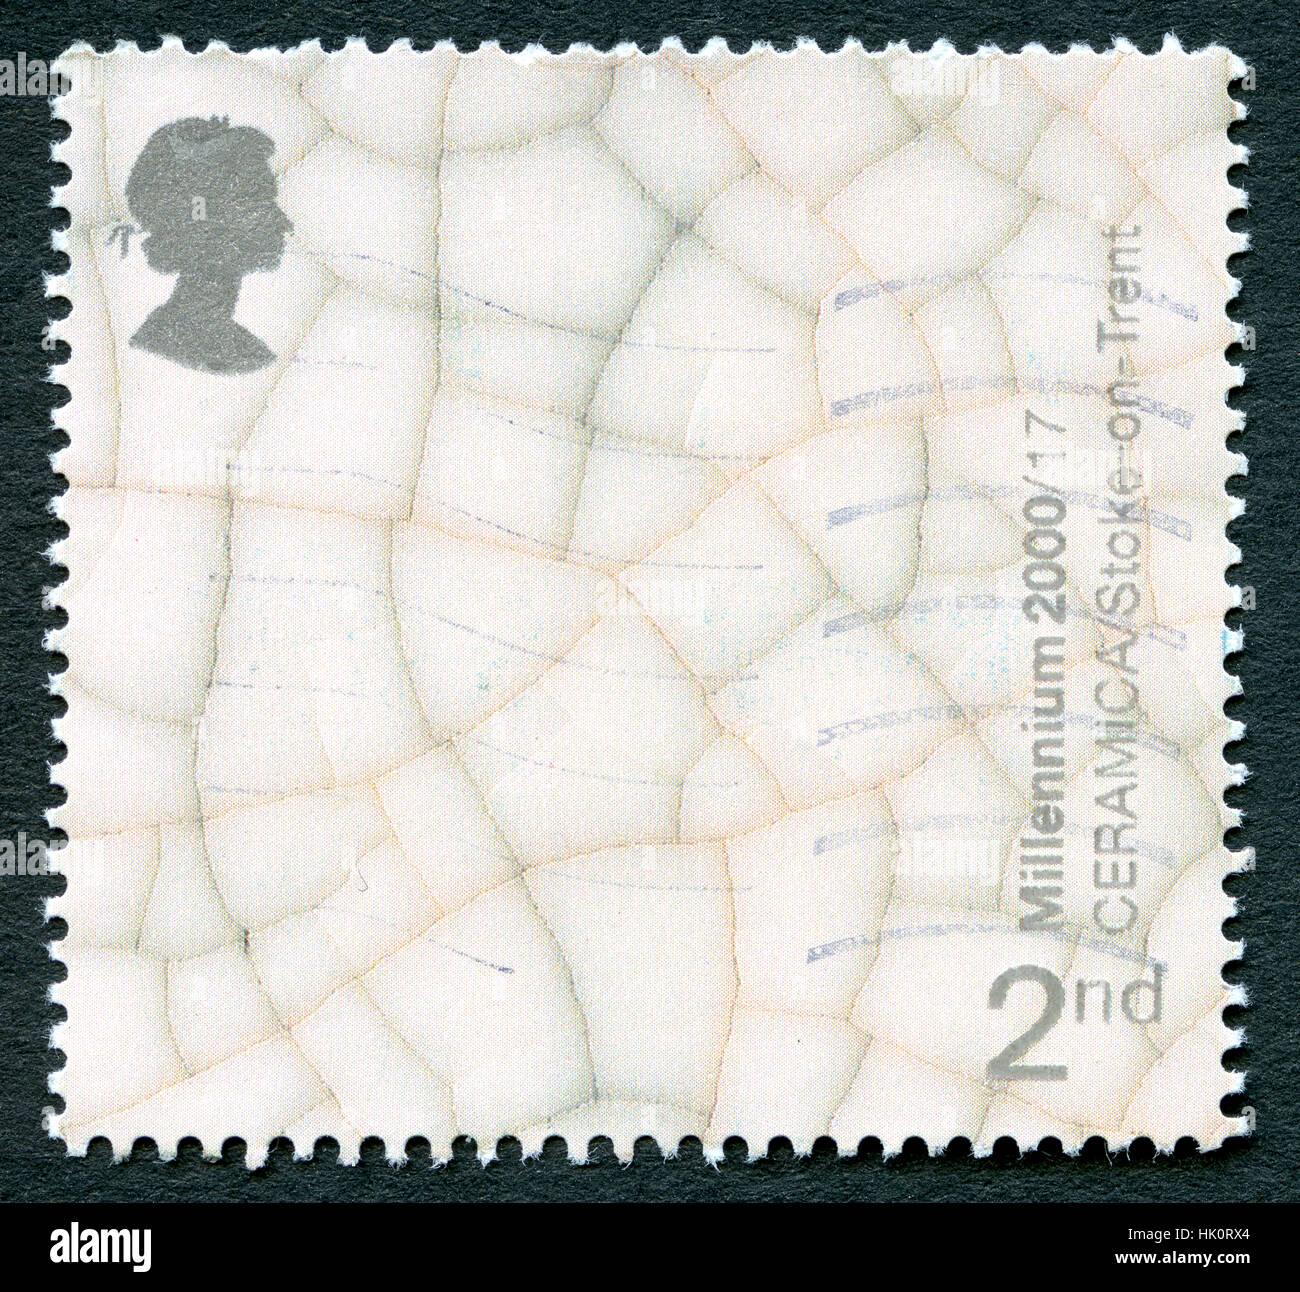 UK - CIRCA 2000: A used UK postage stamp, celebrating Ceramica - a museum in Burslem, Stoke-on-Trent. - Stock Image